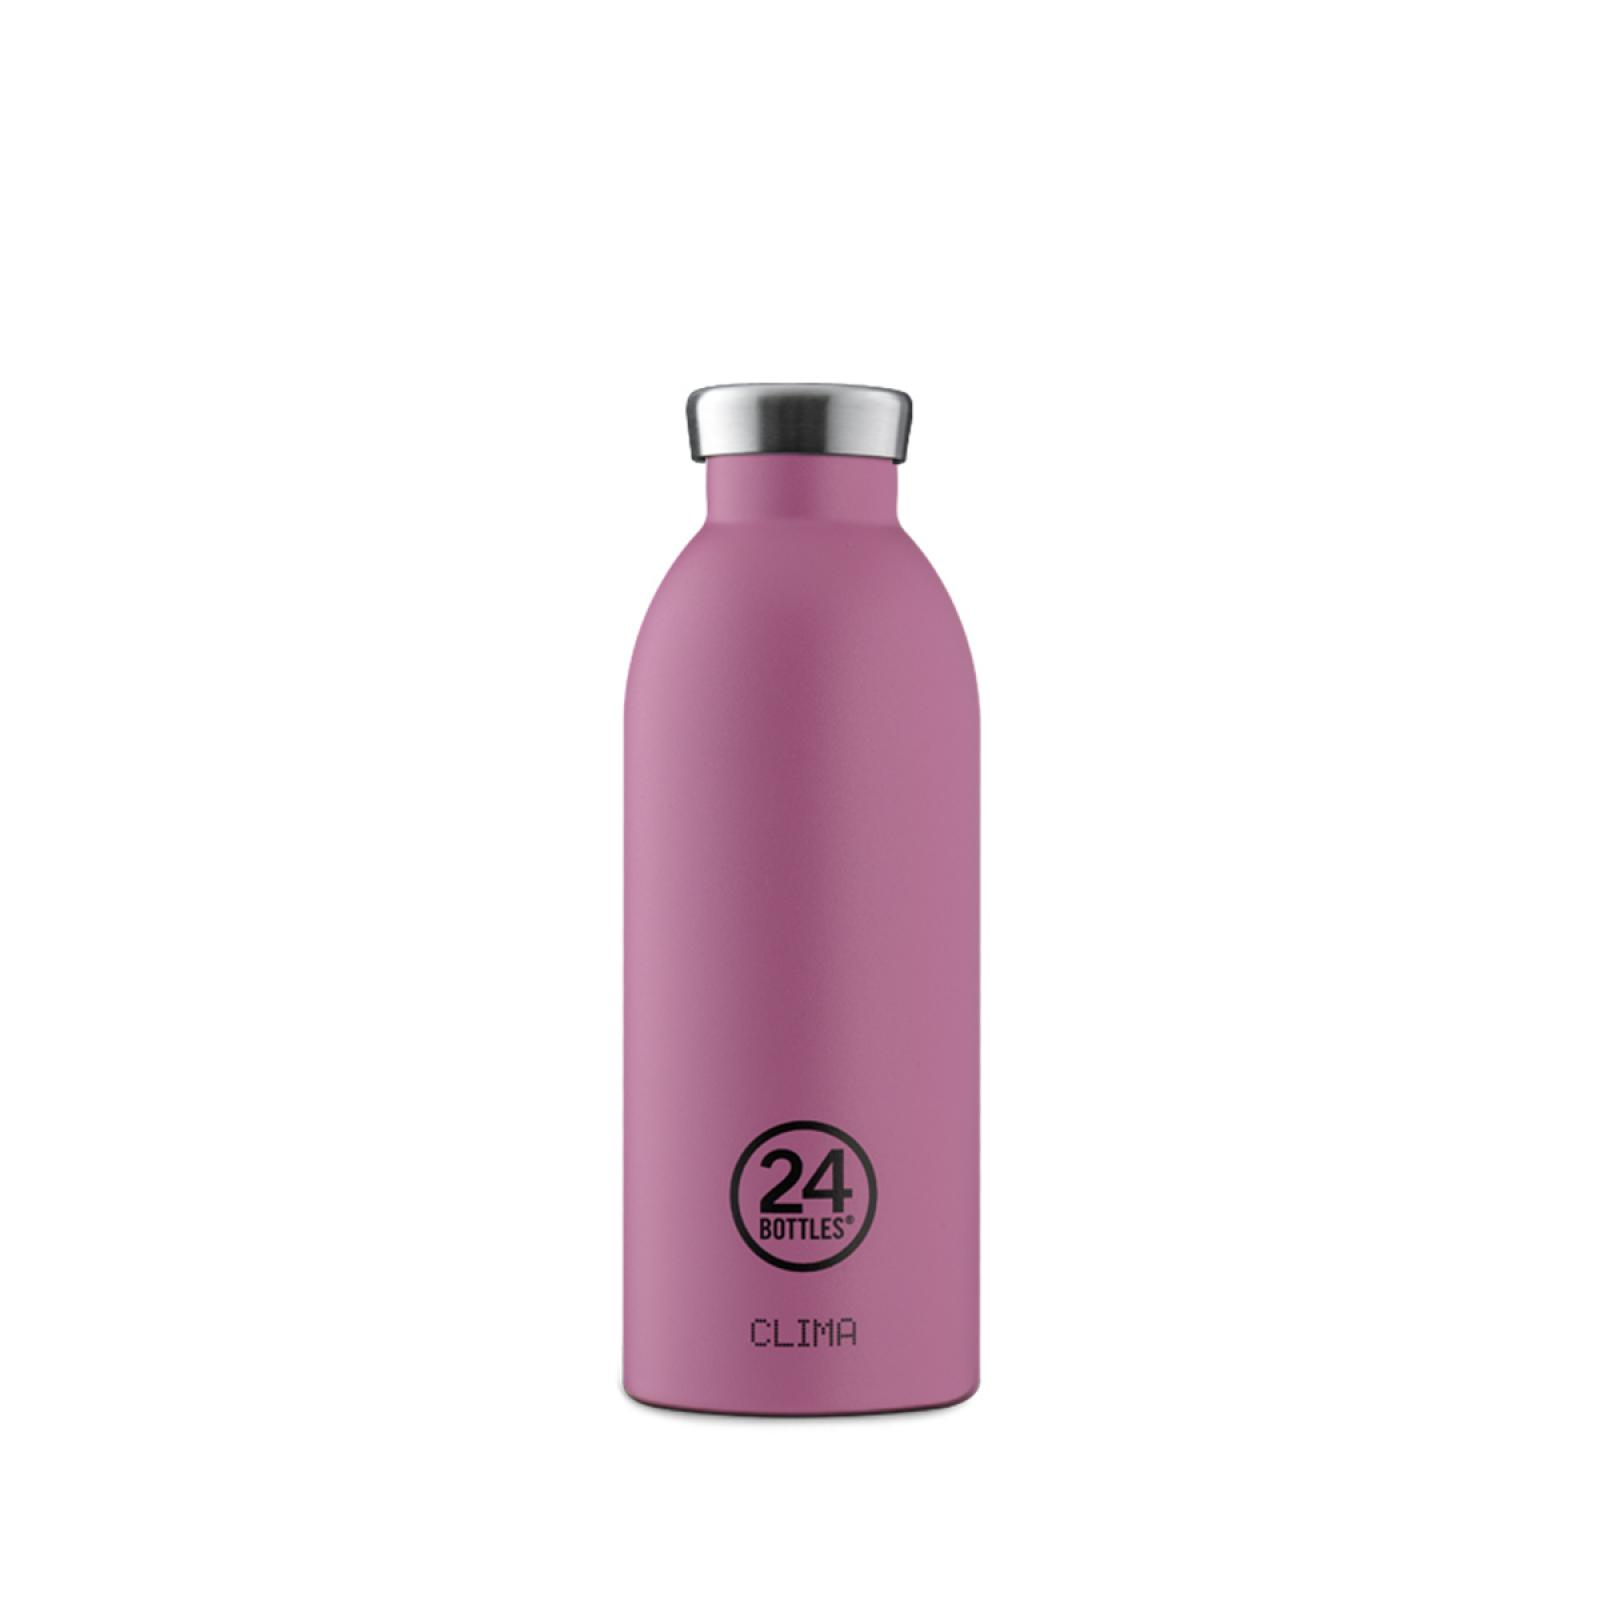 24 Bottles Clima Bottle Mauve 500 ml - 1